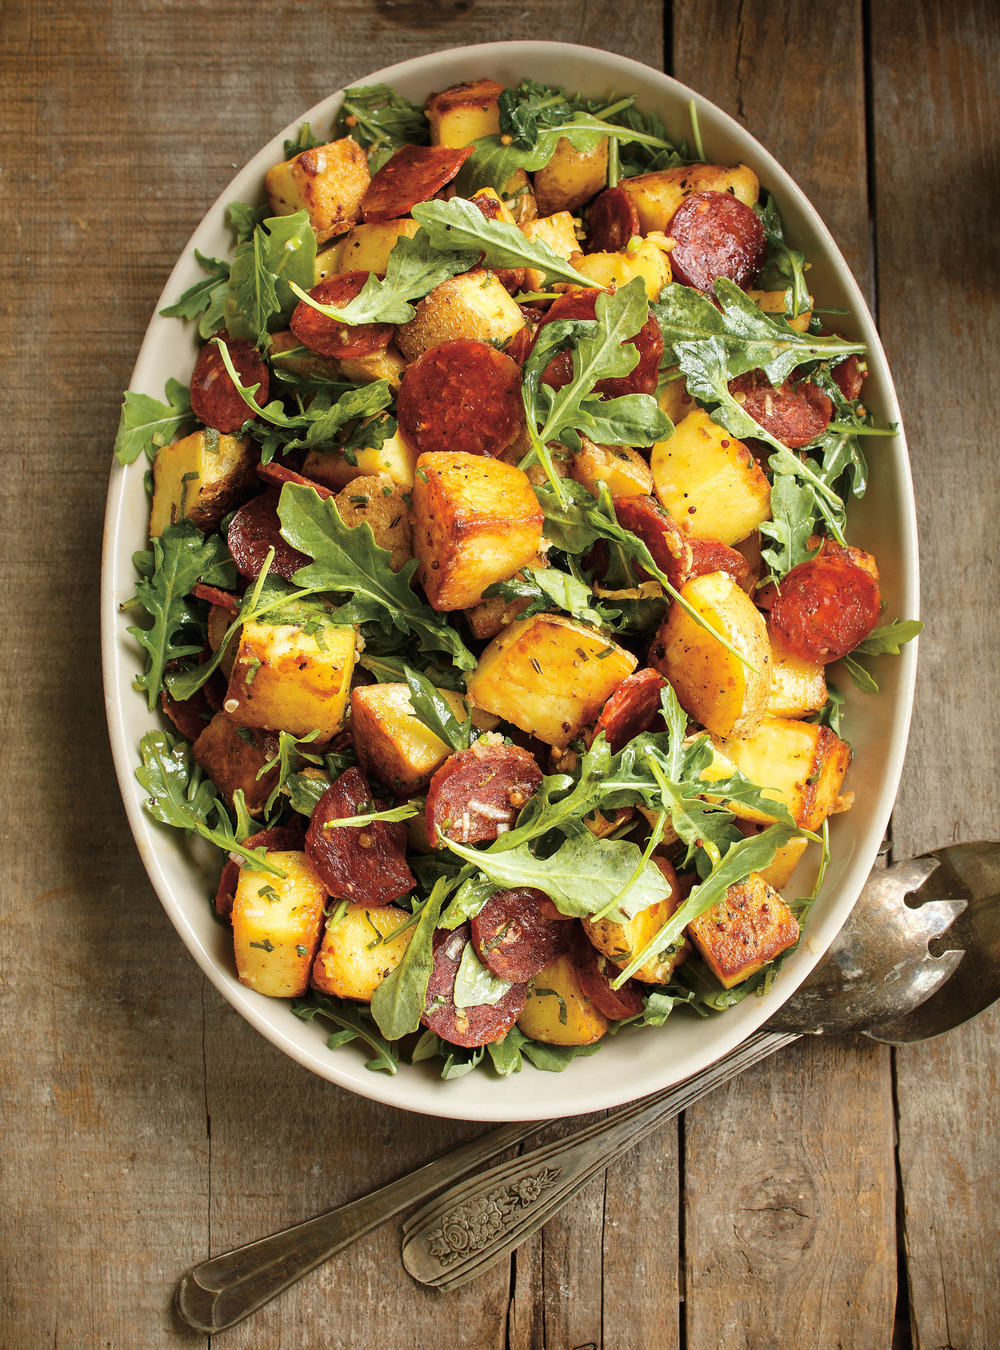 Salade de pommes de terre grill es ricardo for Articles de cuisine ricardo